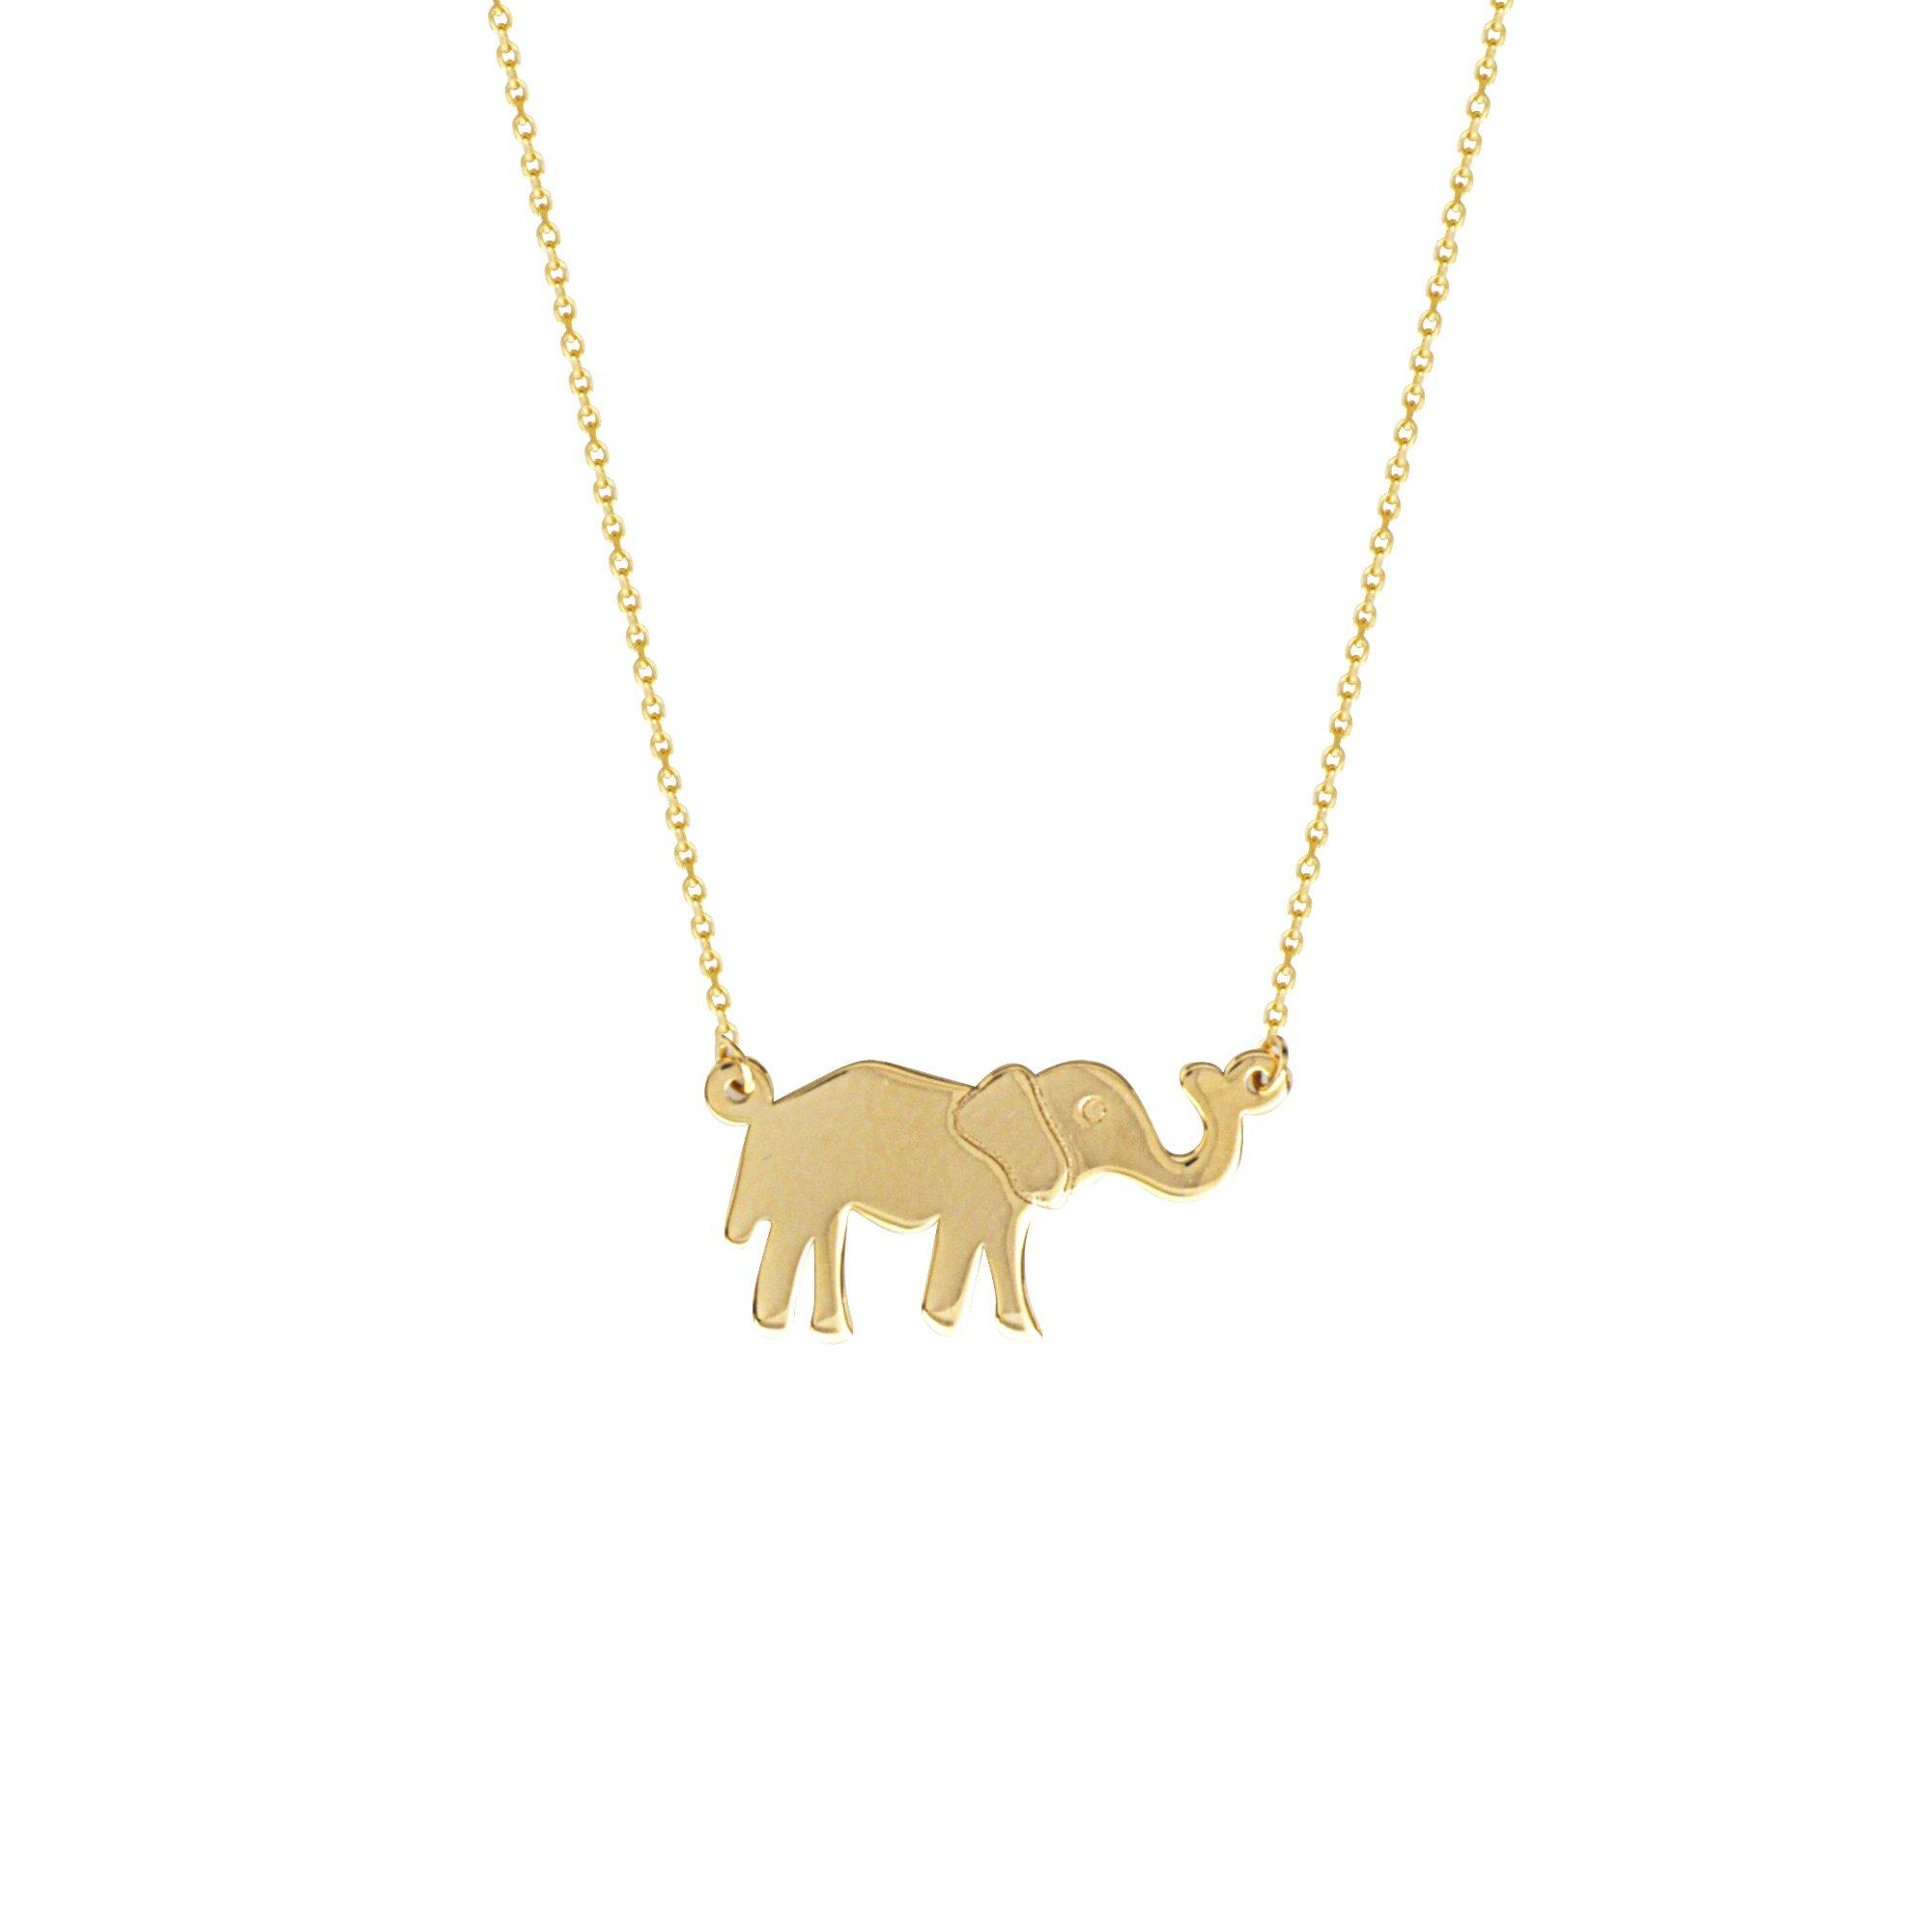 GOLD NECKLACE, 14KT GOLD E2W ADJUSTABLE . ELEPHANT NECKLACE